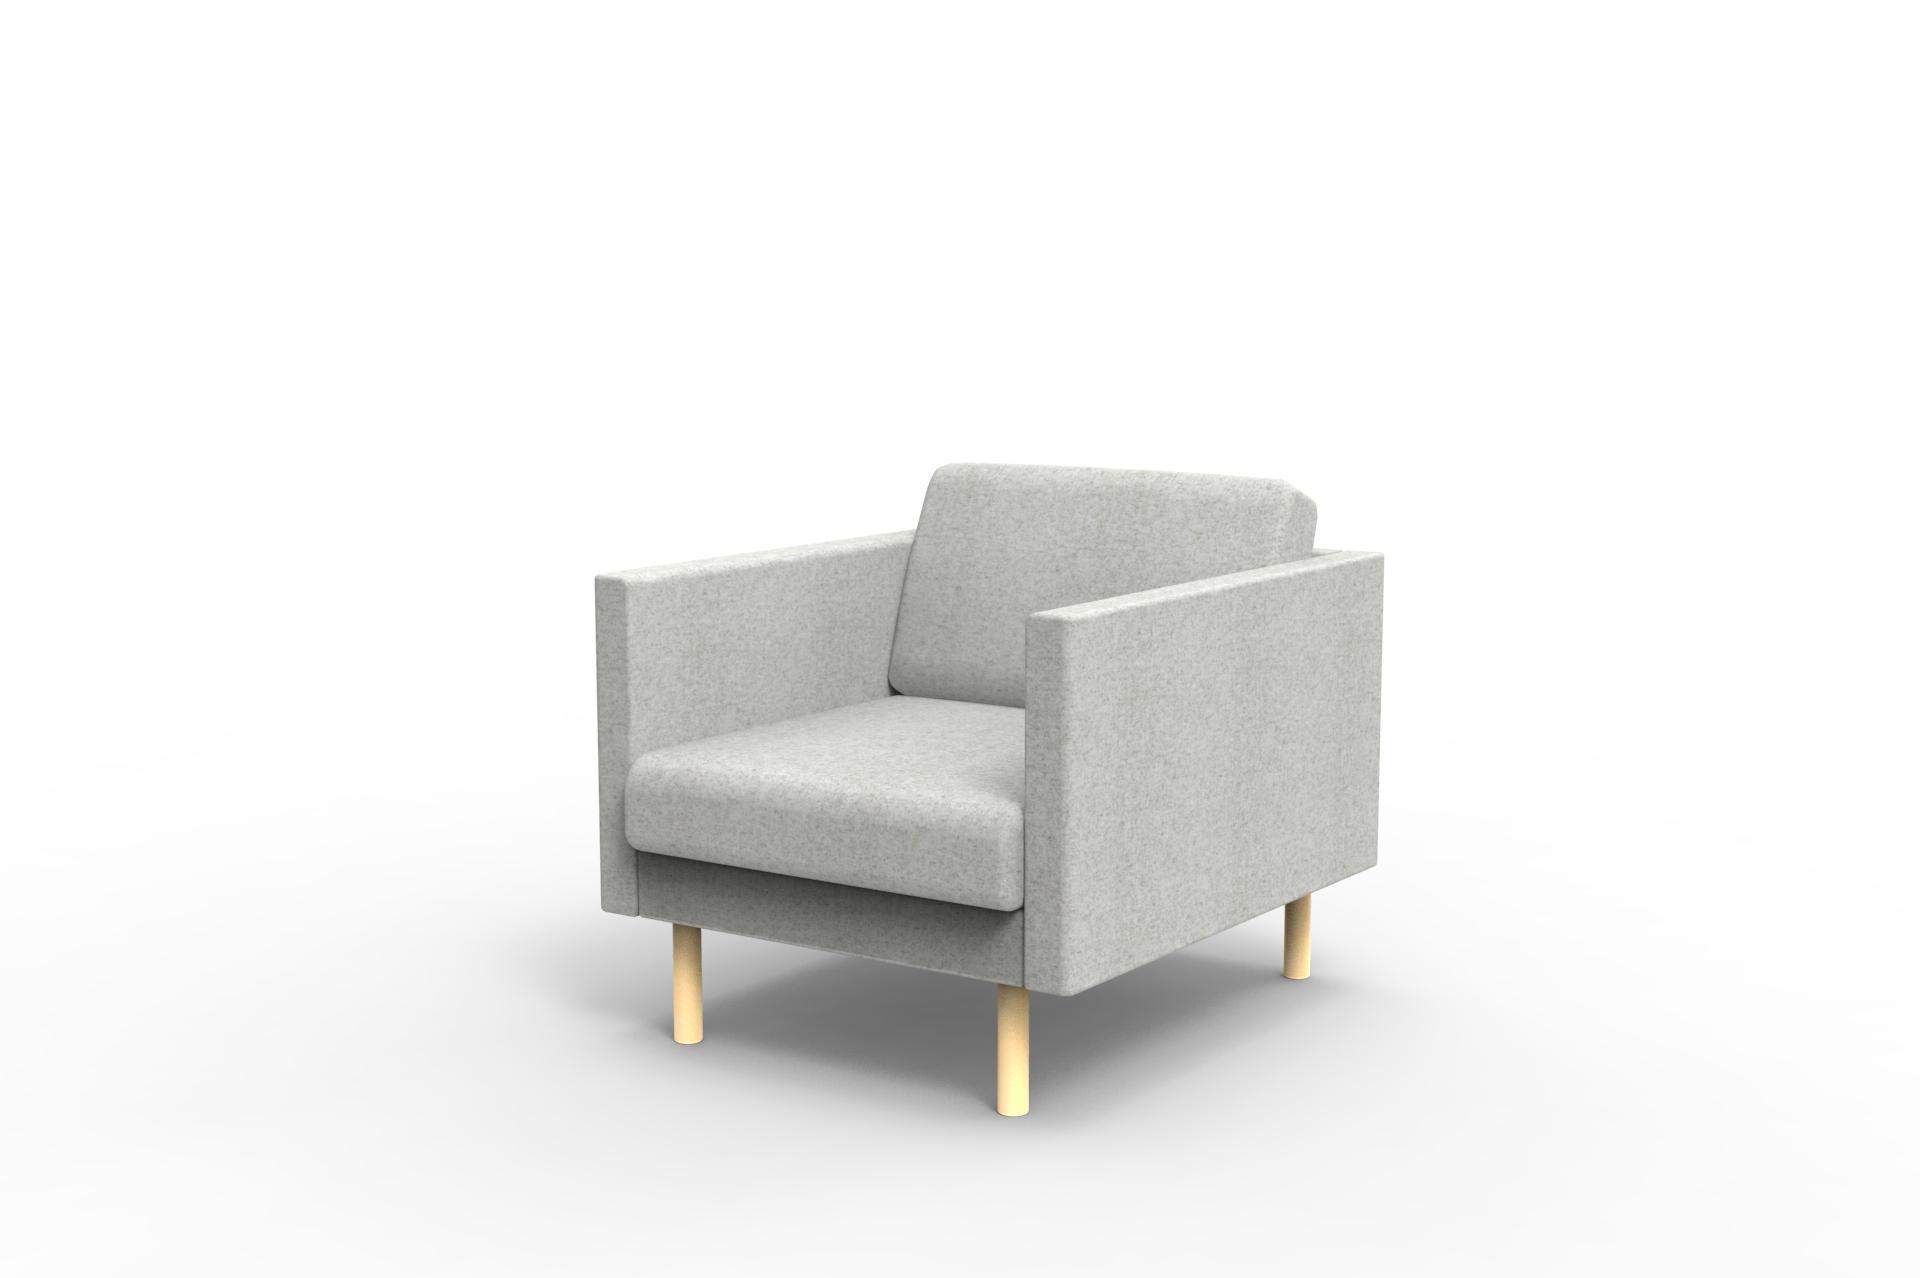 Sessel leaf skandinavisch jetzt online kaufen - Sessel skandinavisch ...